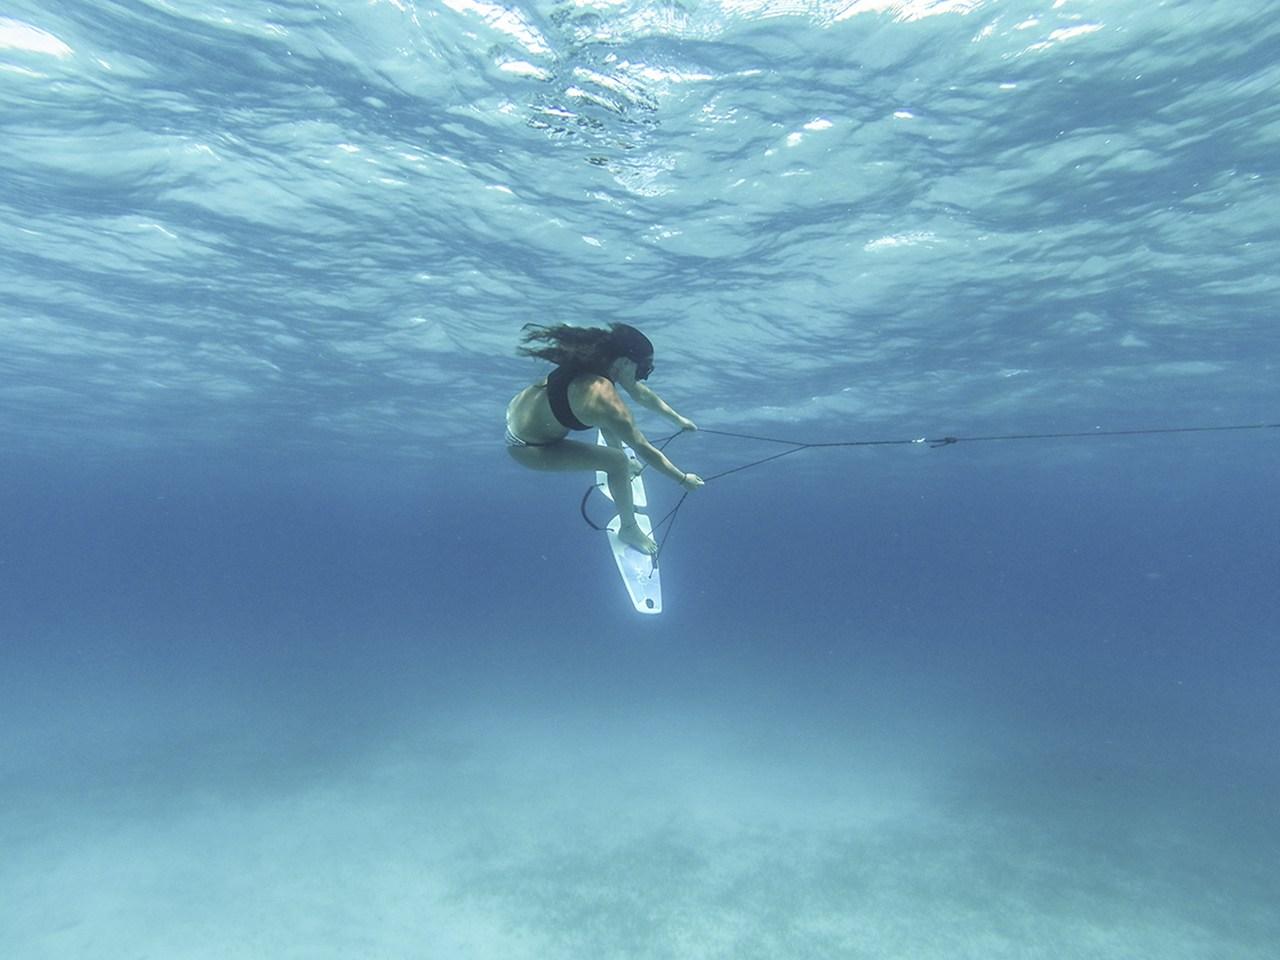 Ski underwater